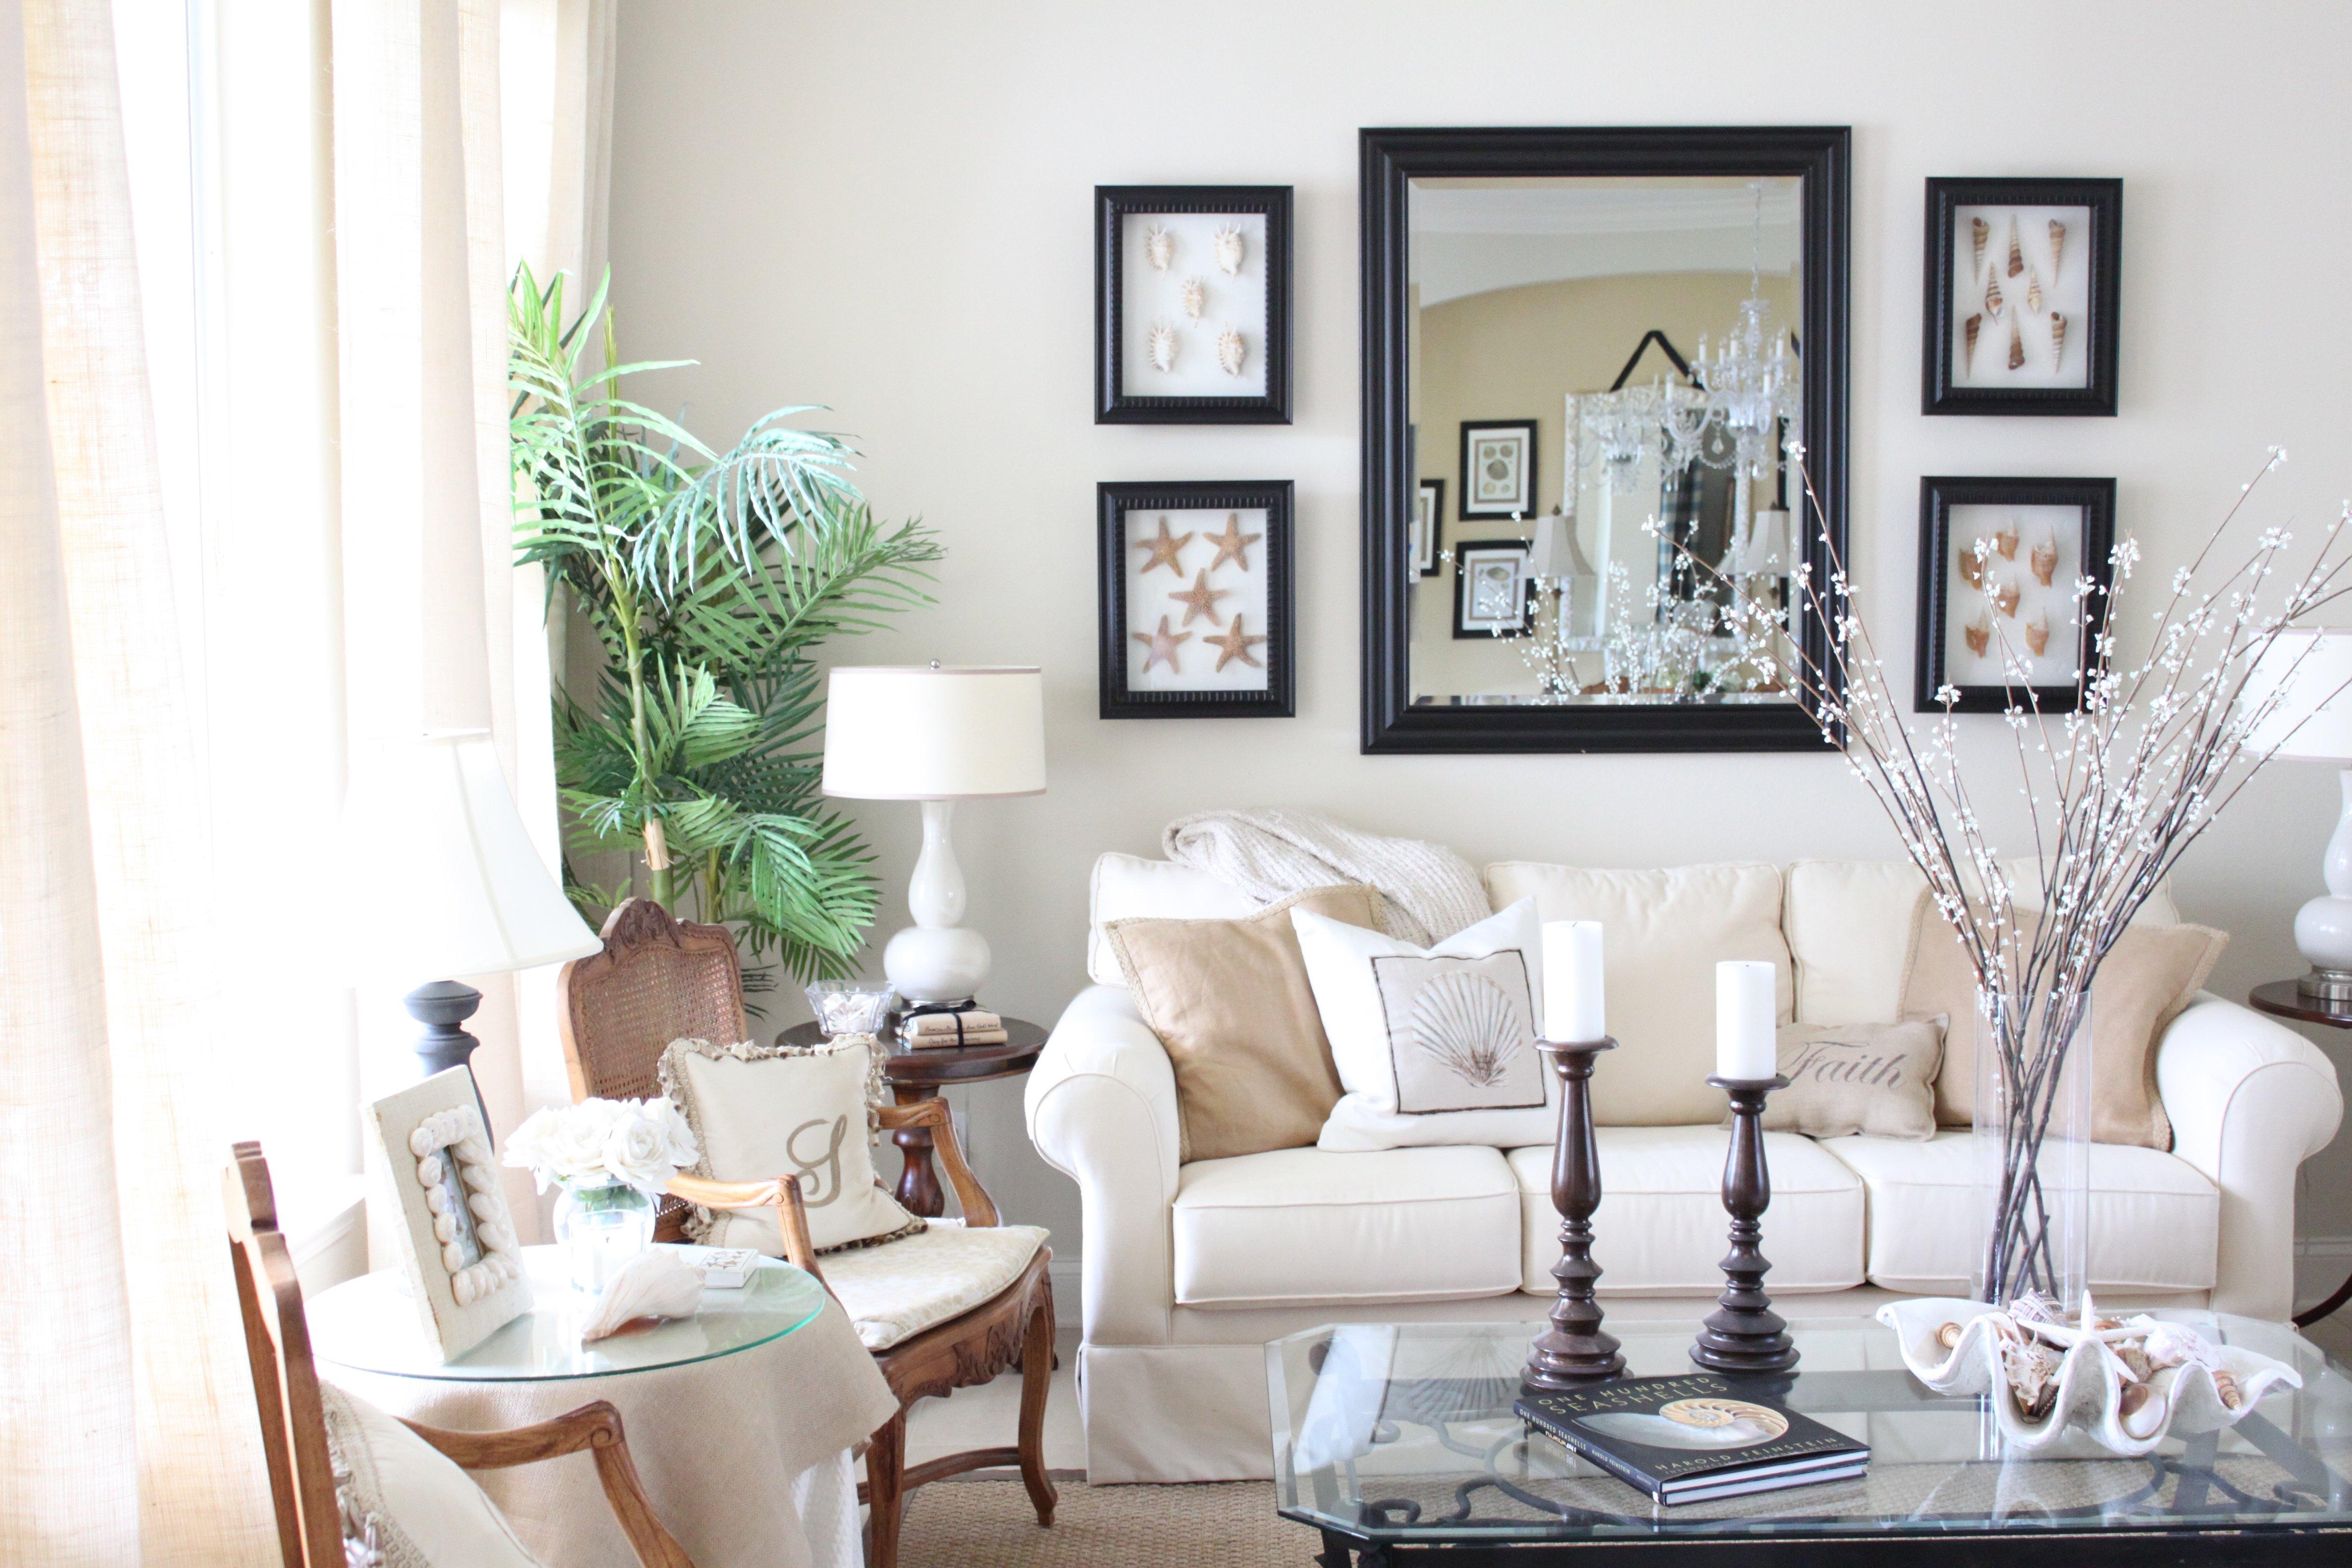 10 Stylish Living Room Decorating Ideas Pinterest pinterest small living room ideas cheap home decor 2021